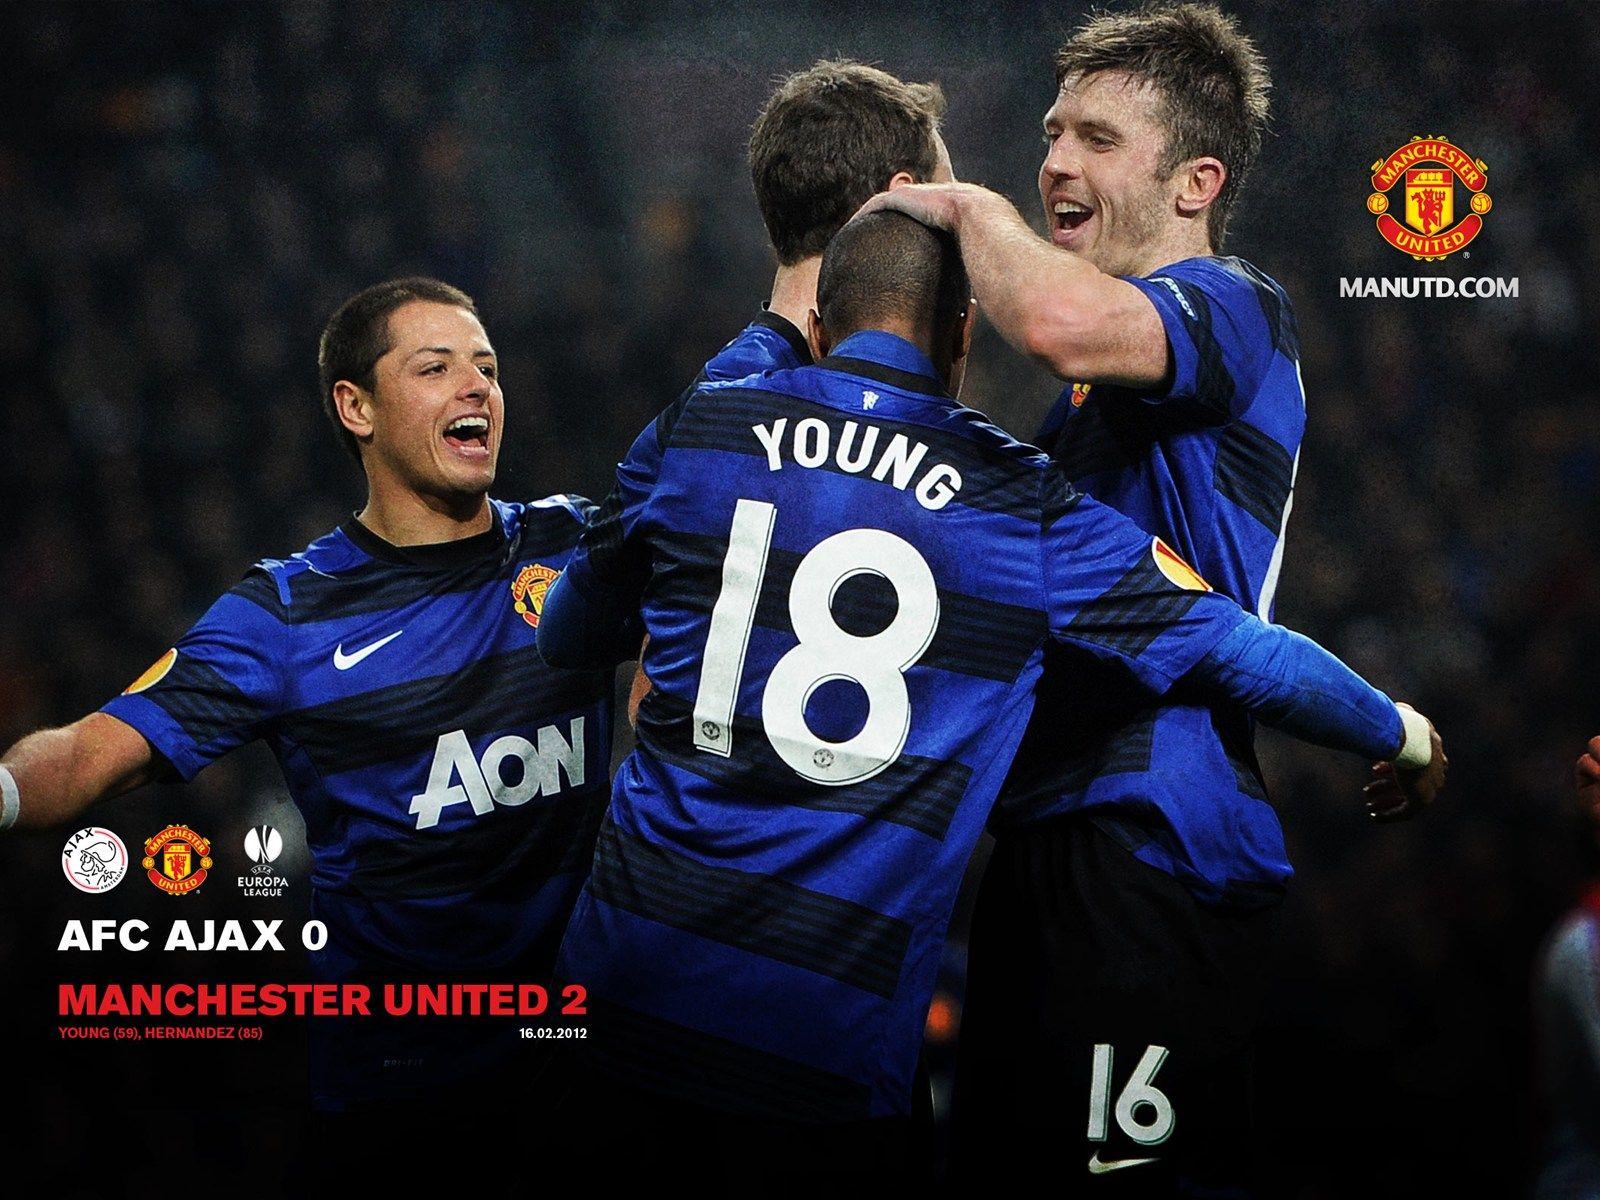 Ajax 0 Vs Man Utd 2 12 02 16 Uefa Europa League Manchester United Official Manchester United Website Manchester United Players